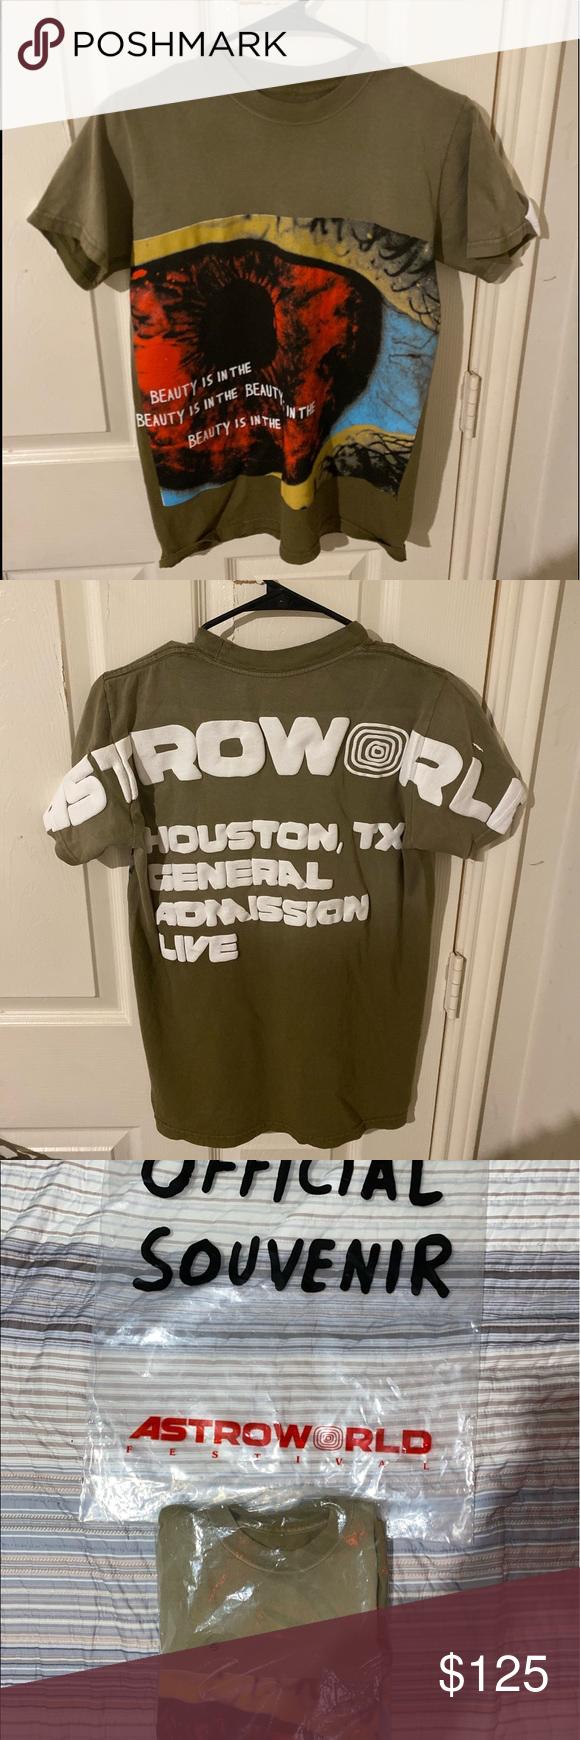 Travis Scott Astroworld Fest Merch 2019 Green Sz S Travis Scott Astroworld Travis Scott Shirt Travis Scott